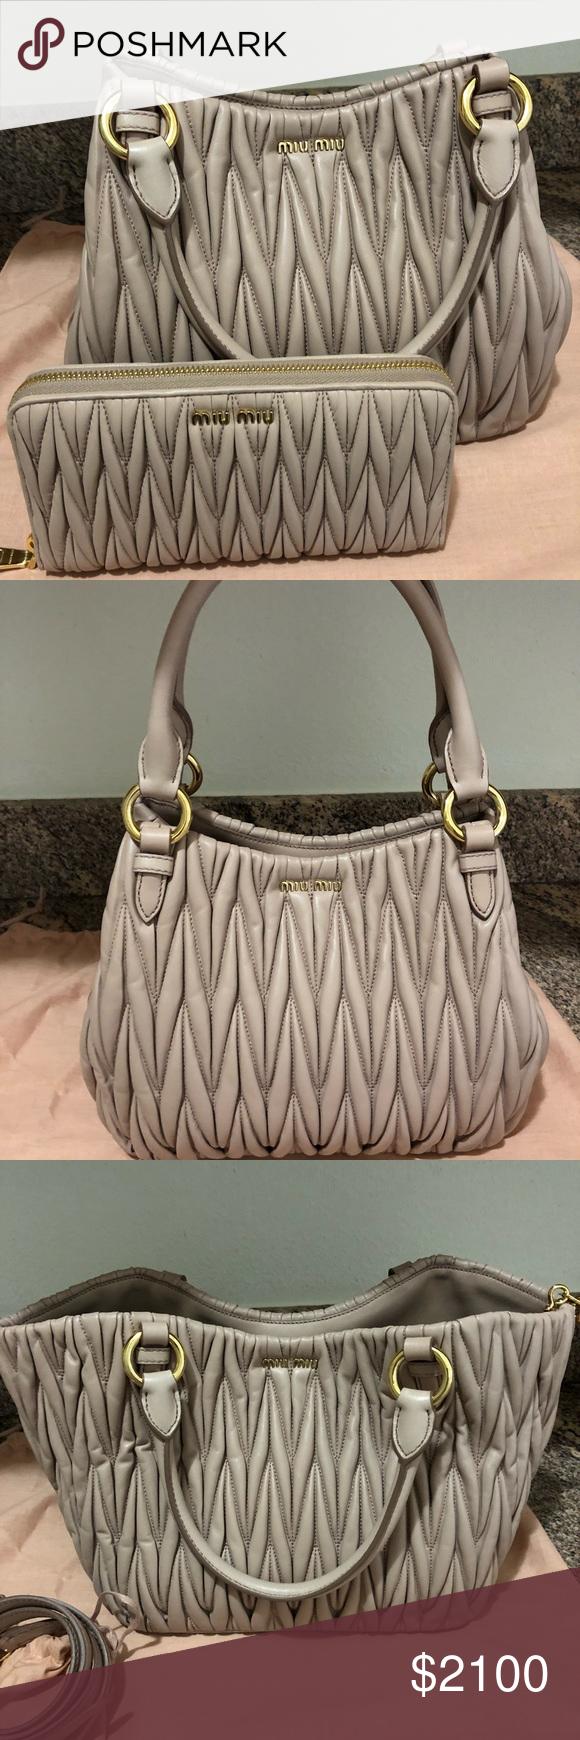 dcc7a85285a0 Miu Miu Matelasse handbag and matching wallet new Miu Miu coveted Matelasse  handbag and matching wallet. Authentic and new. Cammeo color Miu Miu Bags  ...